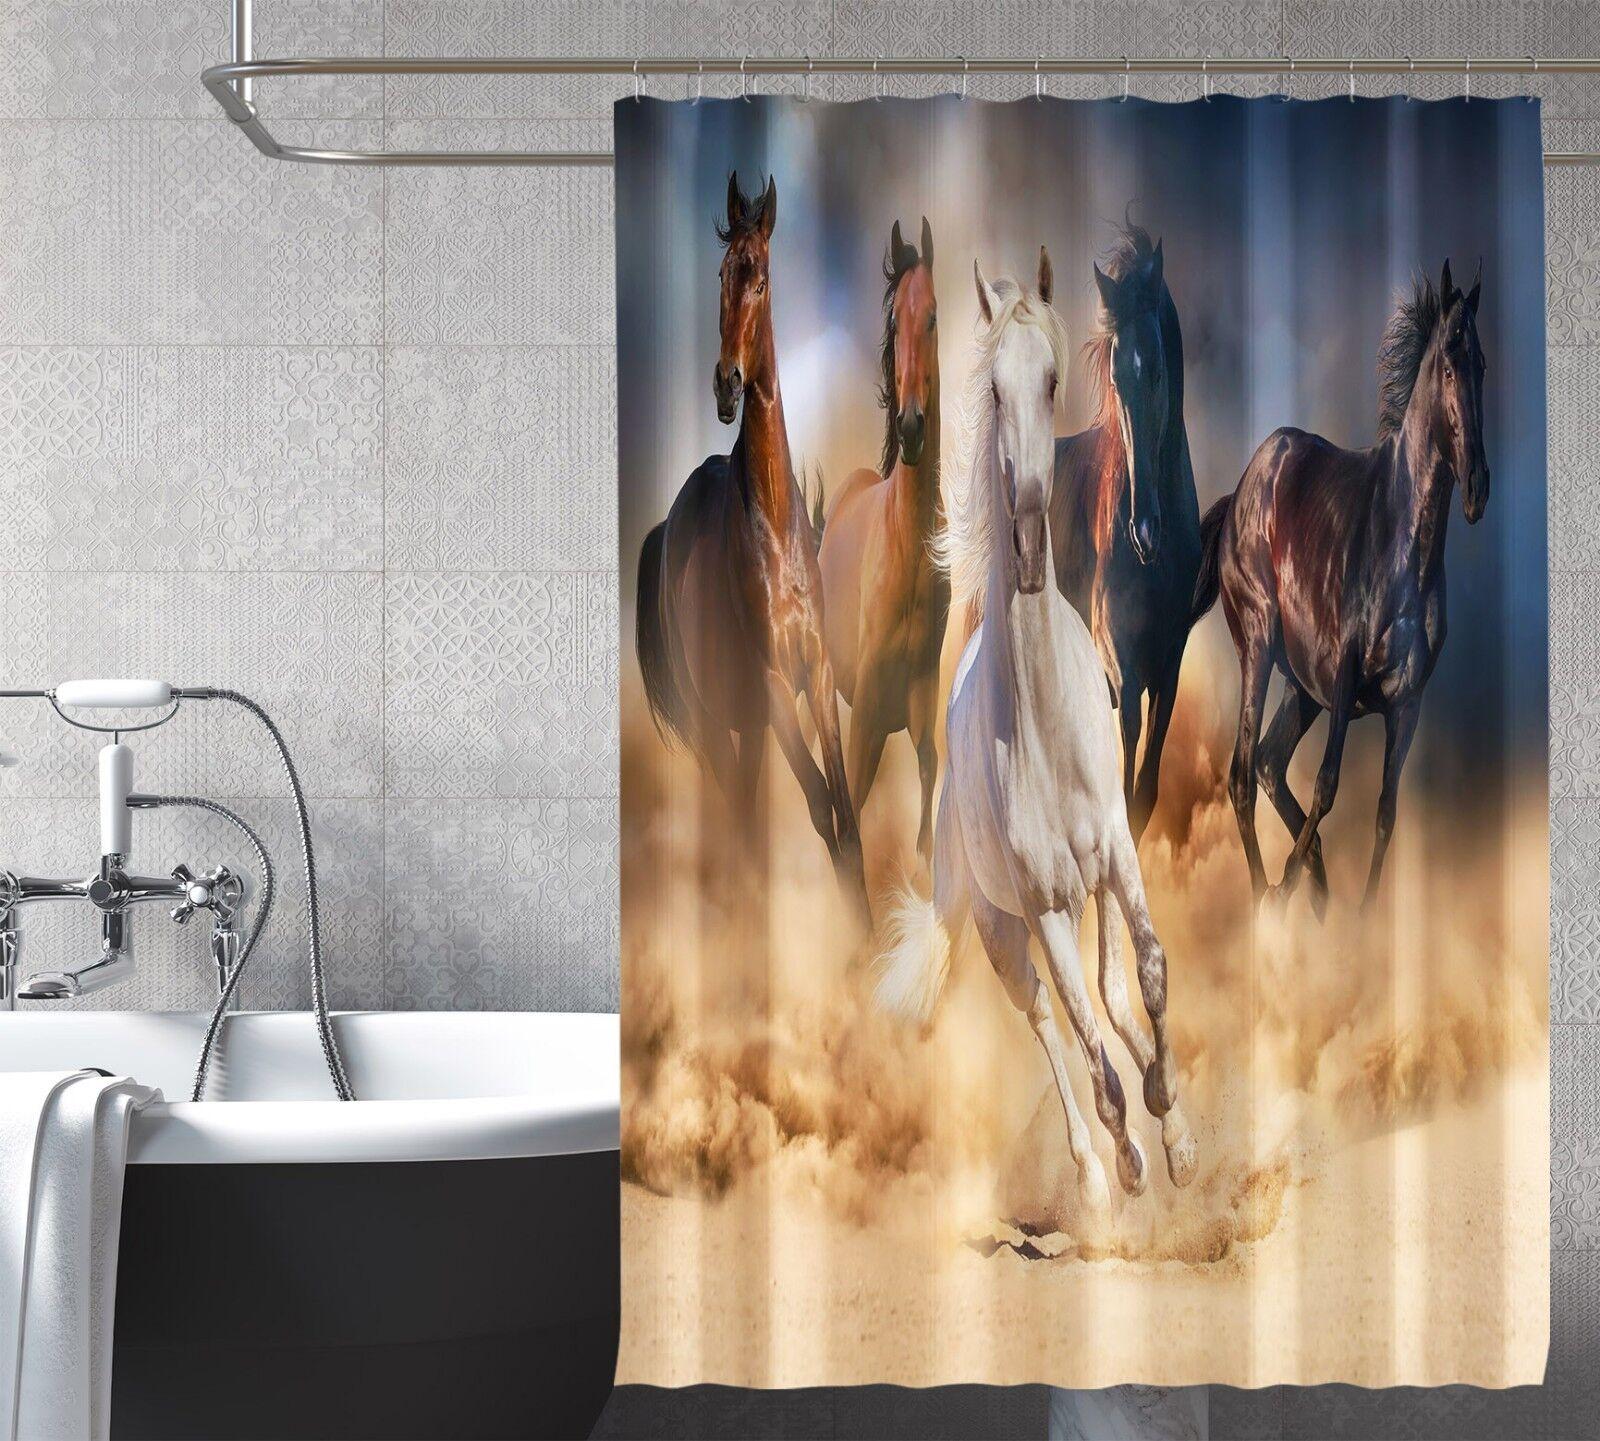 Pferd Braun 3D DE Toilette Windows Daheim Bad Faser ...